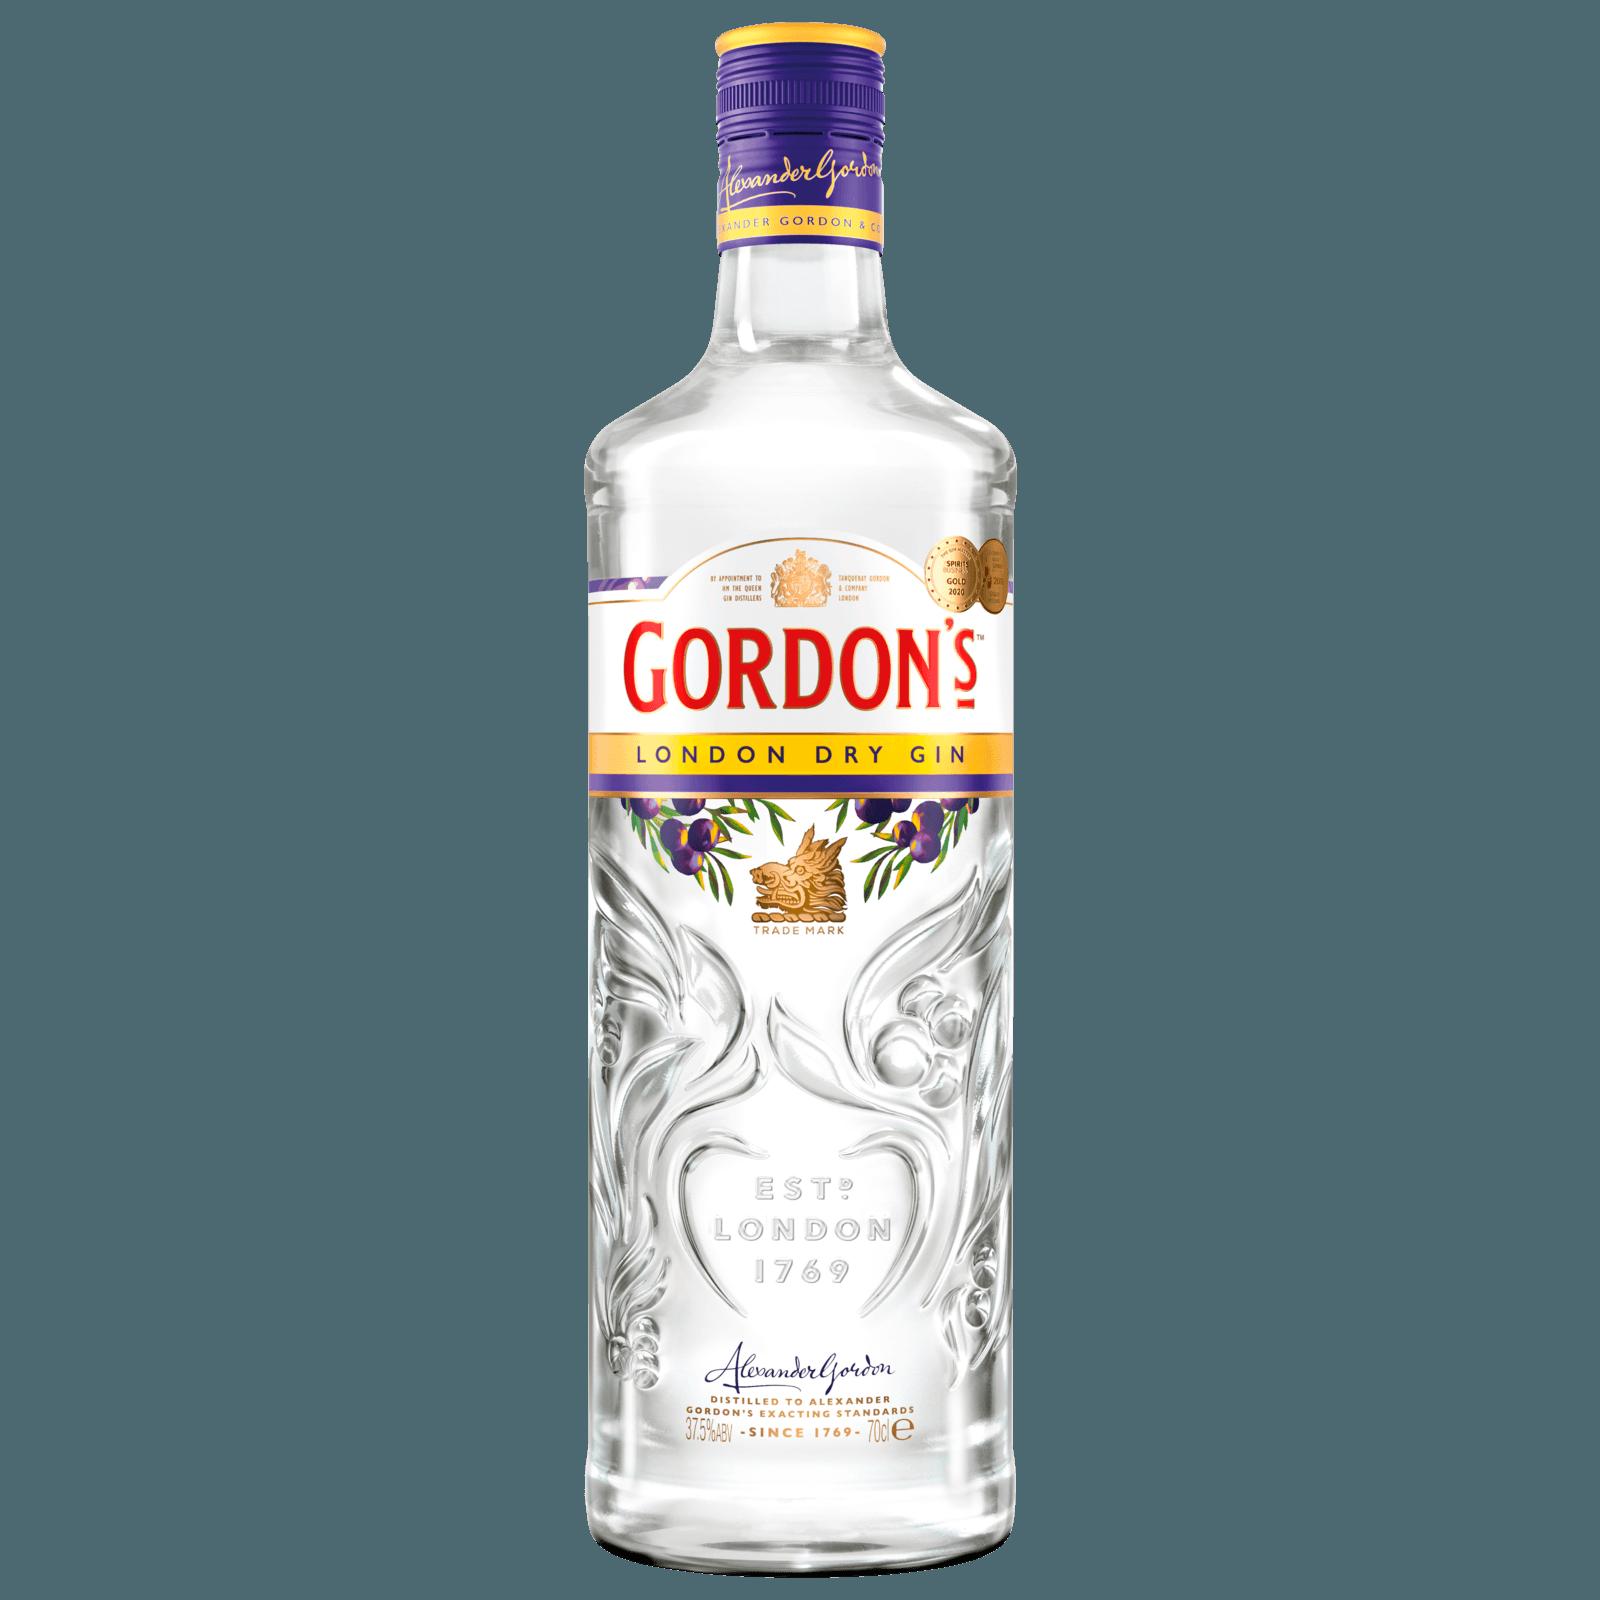 Gordon\'s Gin 0,7l bei REWE online bestellen! REWE.de